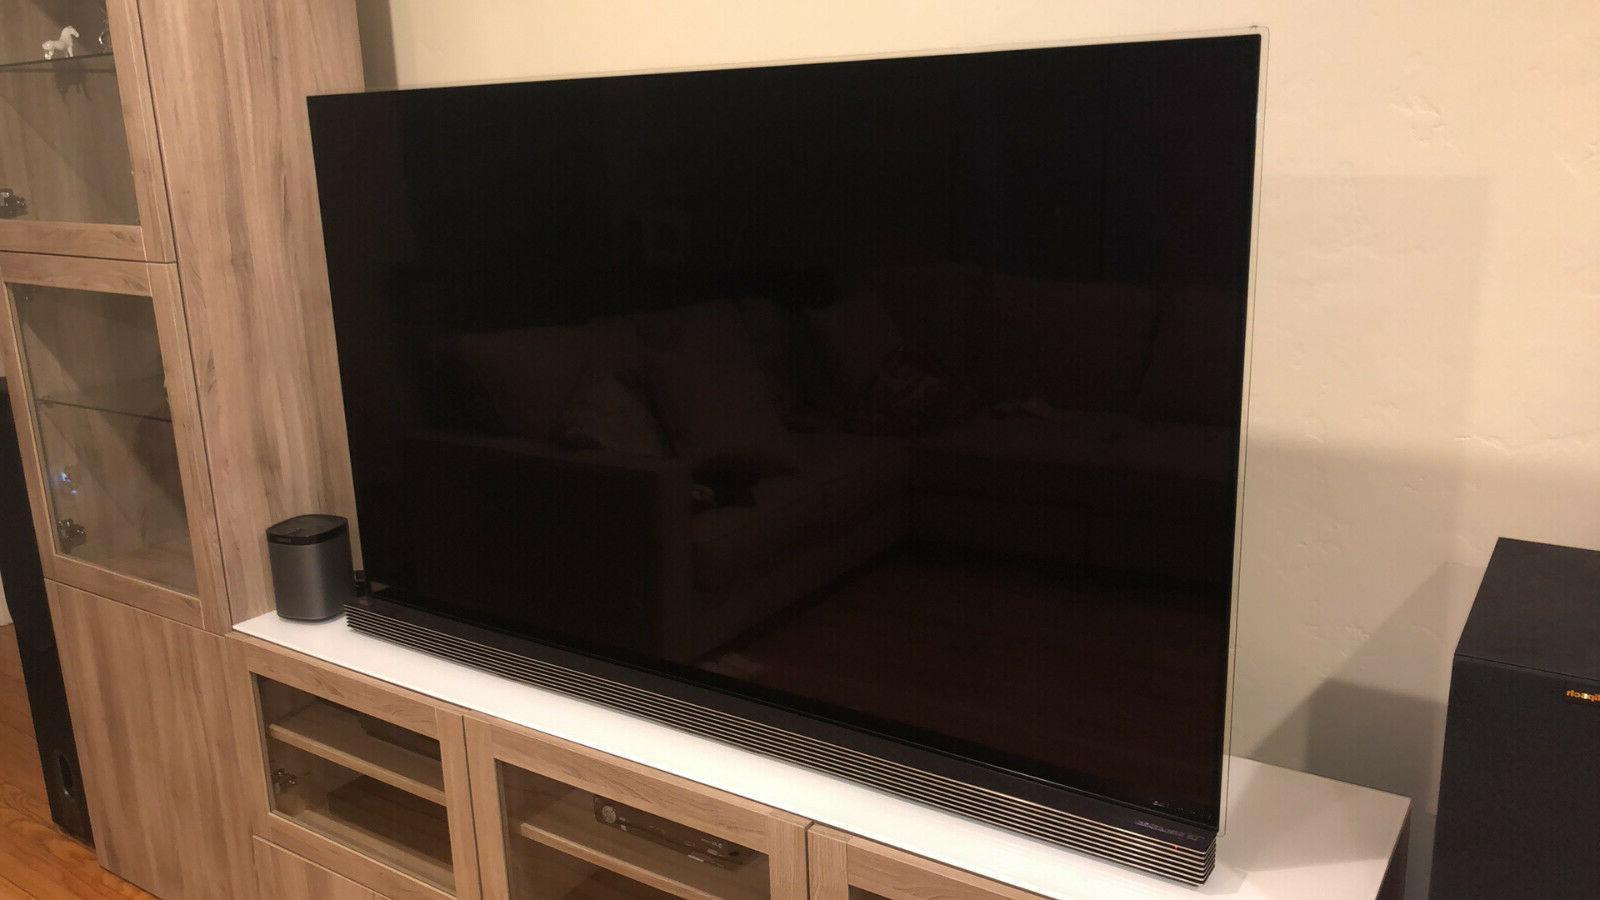 LG 4K HDR 2160p UHD OLED Television